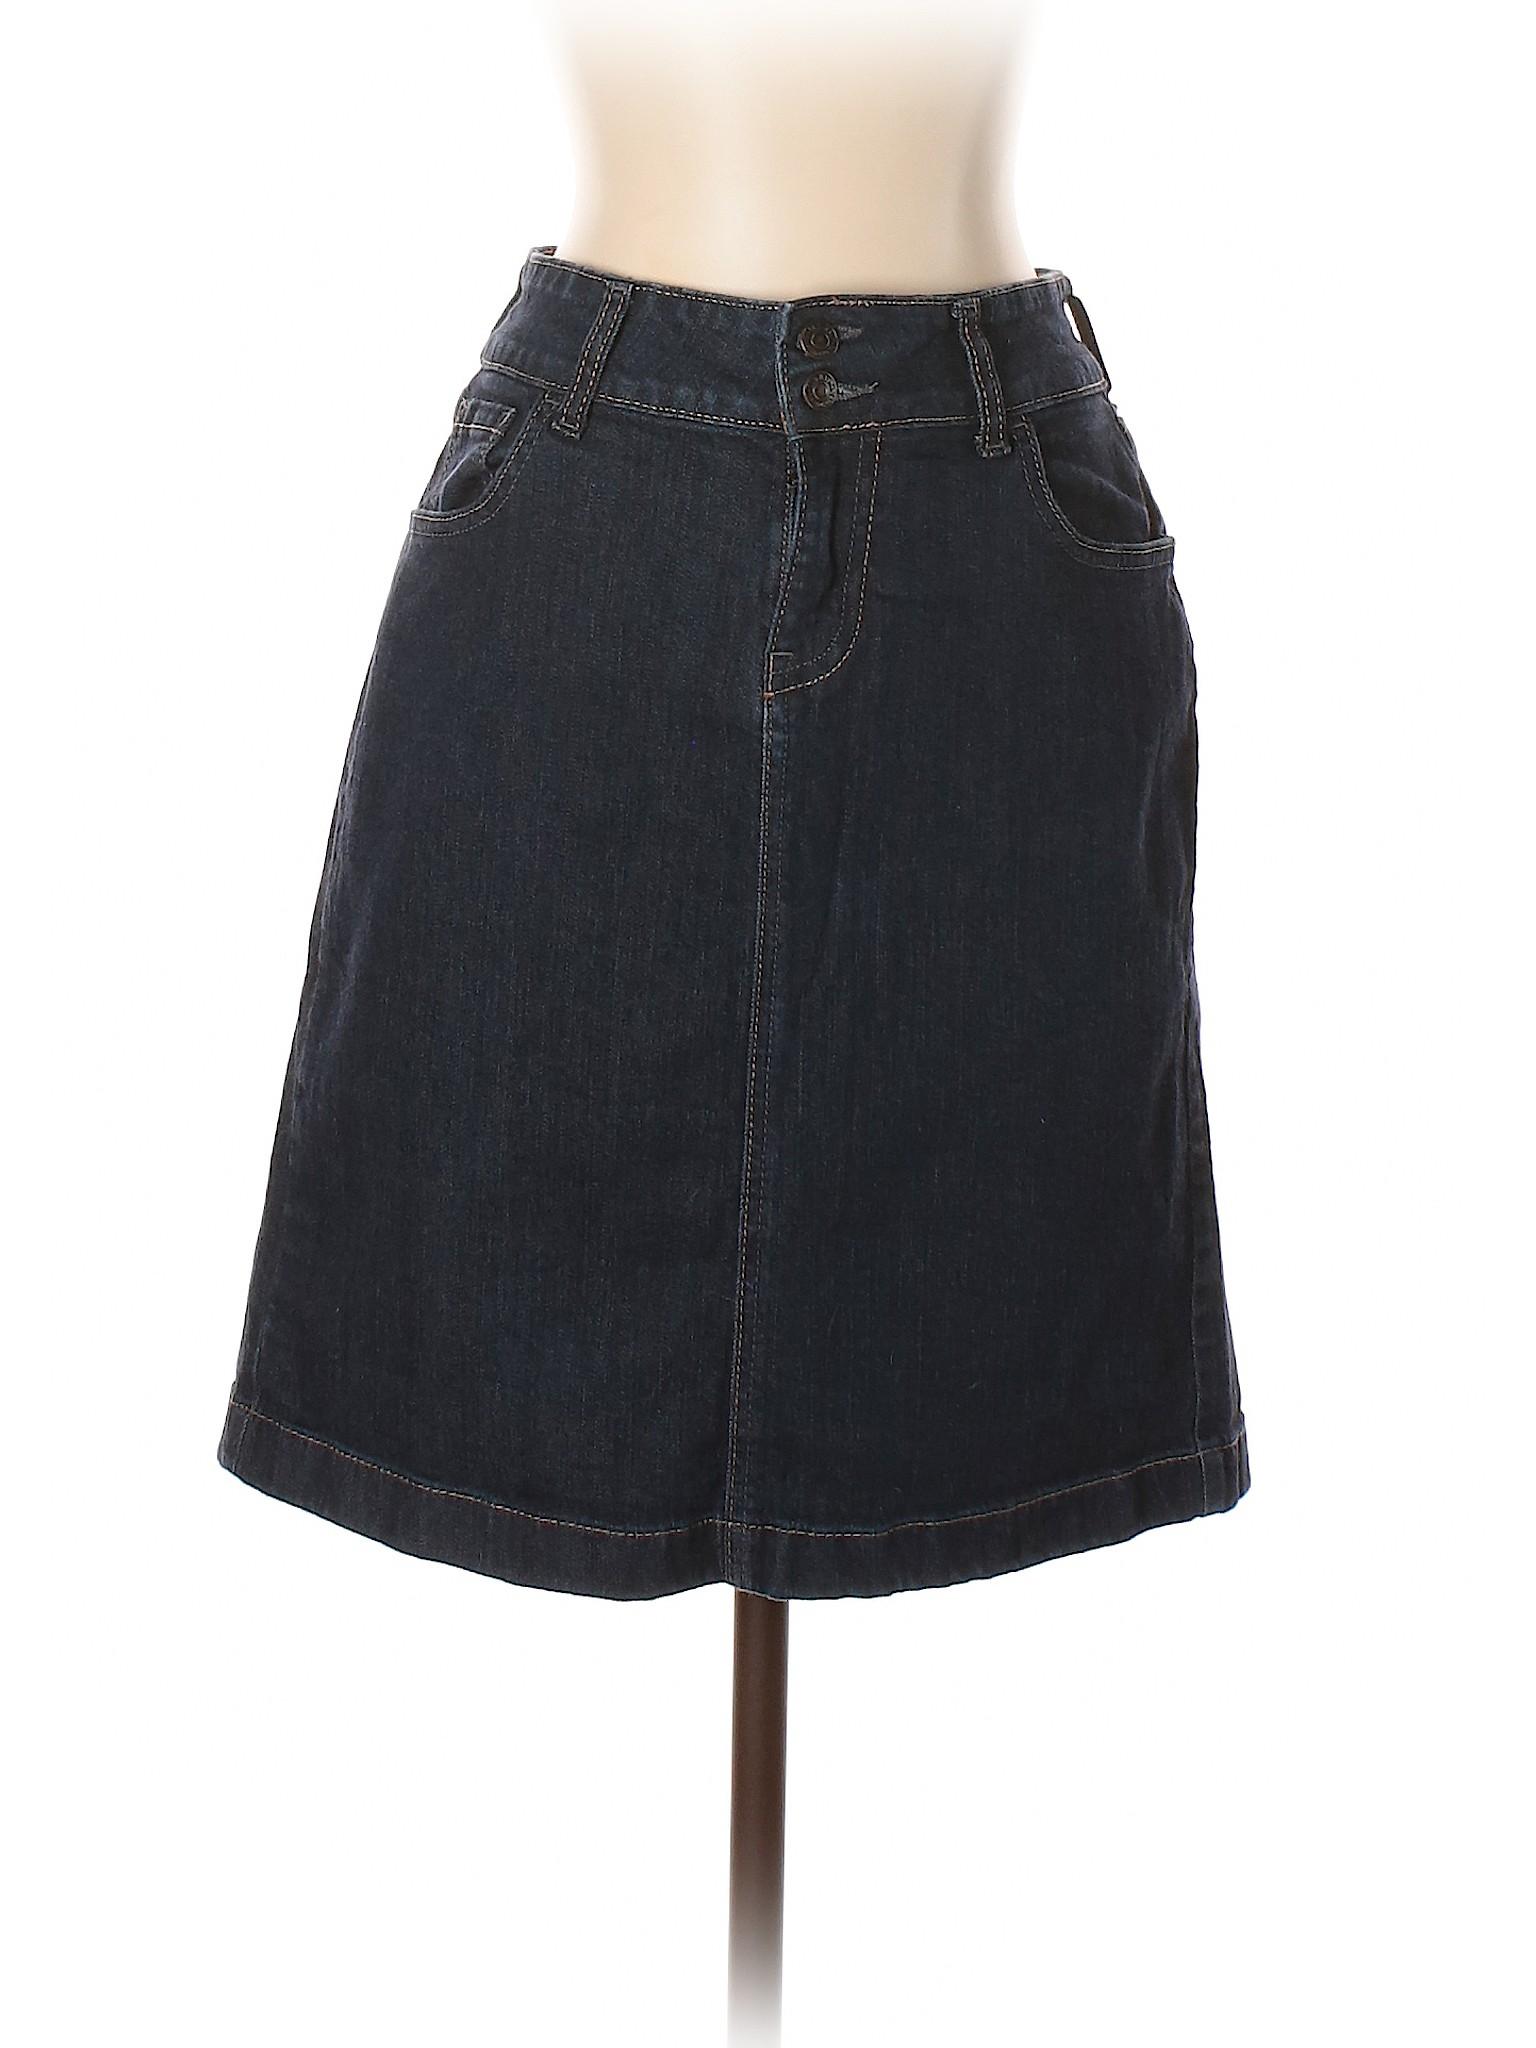 Navy Skirt Skirt Navy Old Denim Boutique Old Denim Boutique Old Navy Boutique qgfxwn5OEC